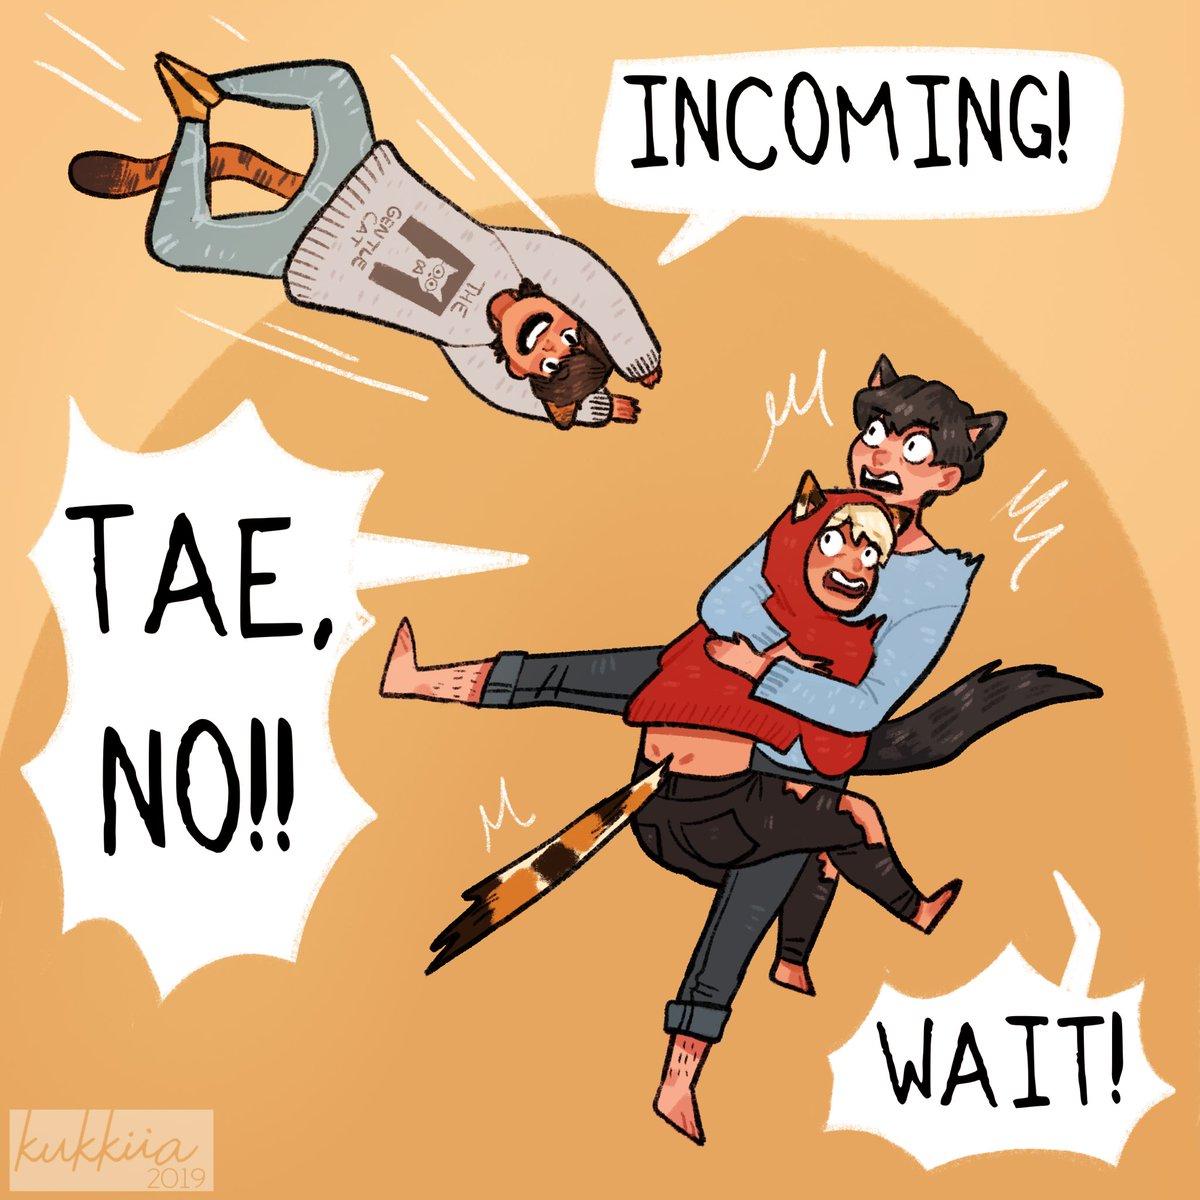 taejinmin hashtag on Twitter